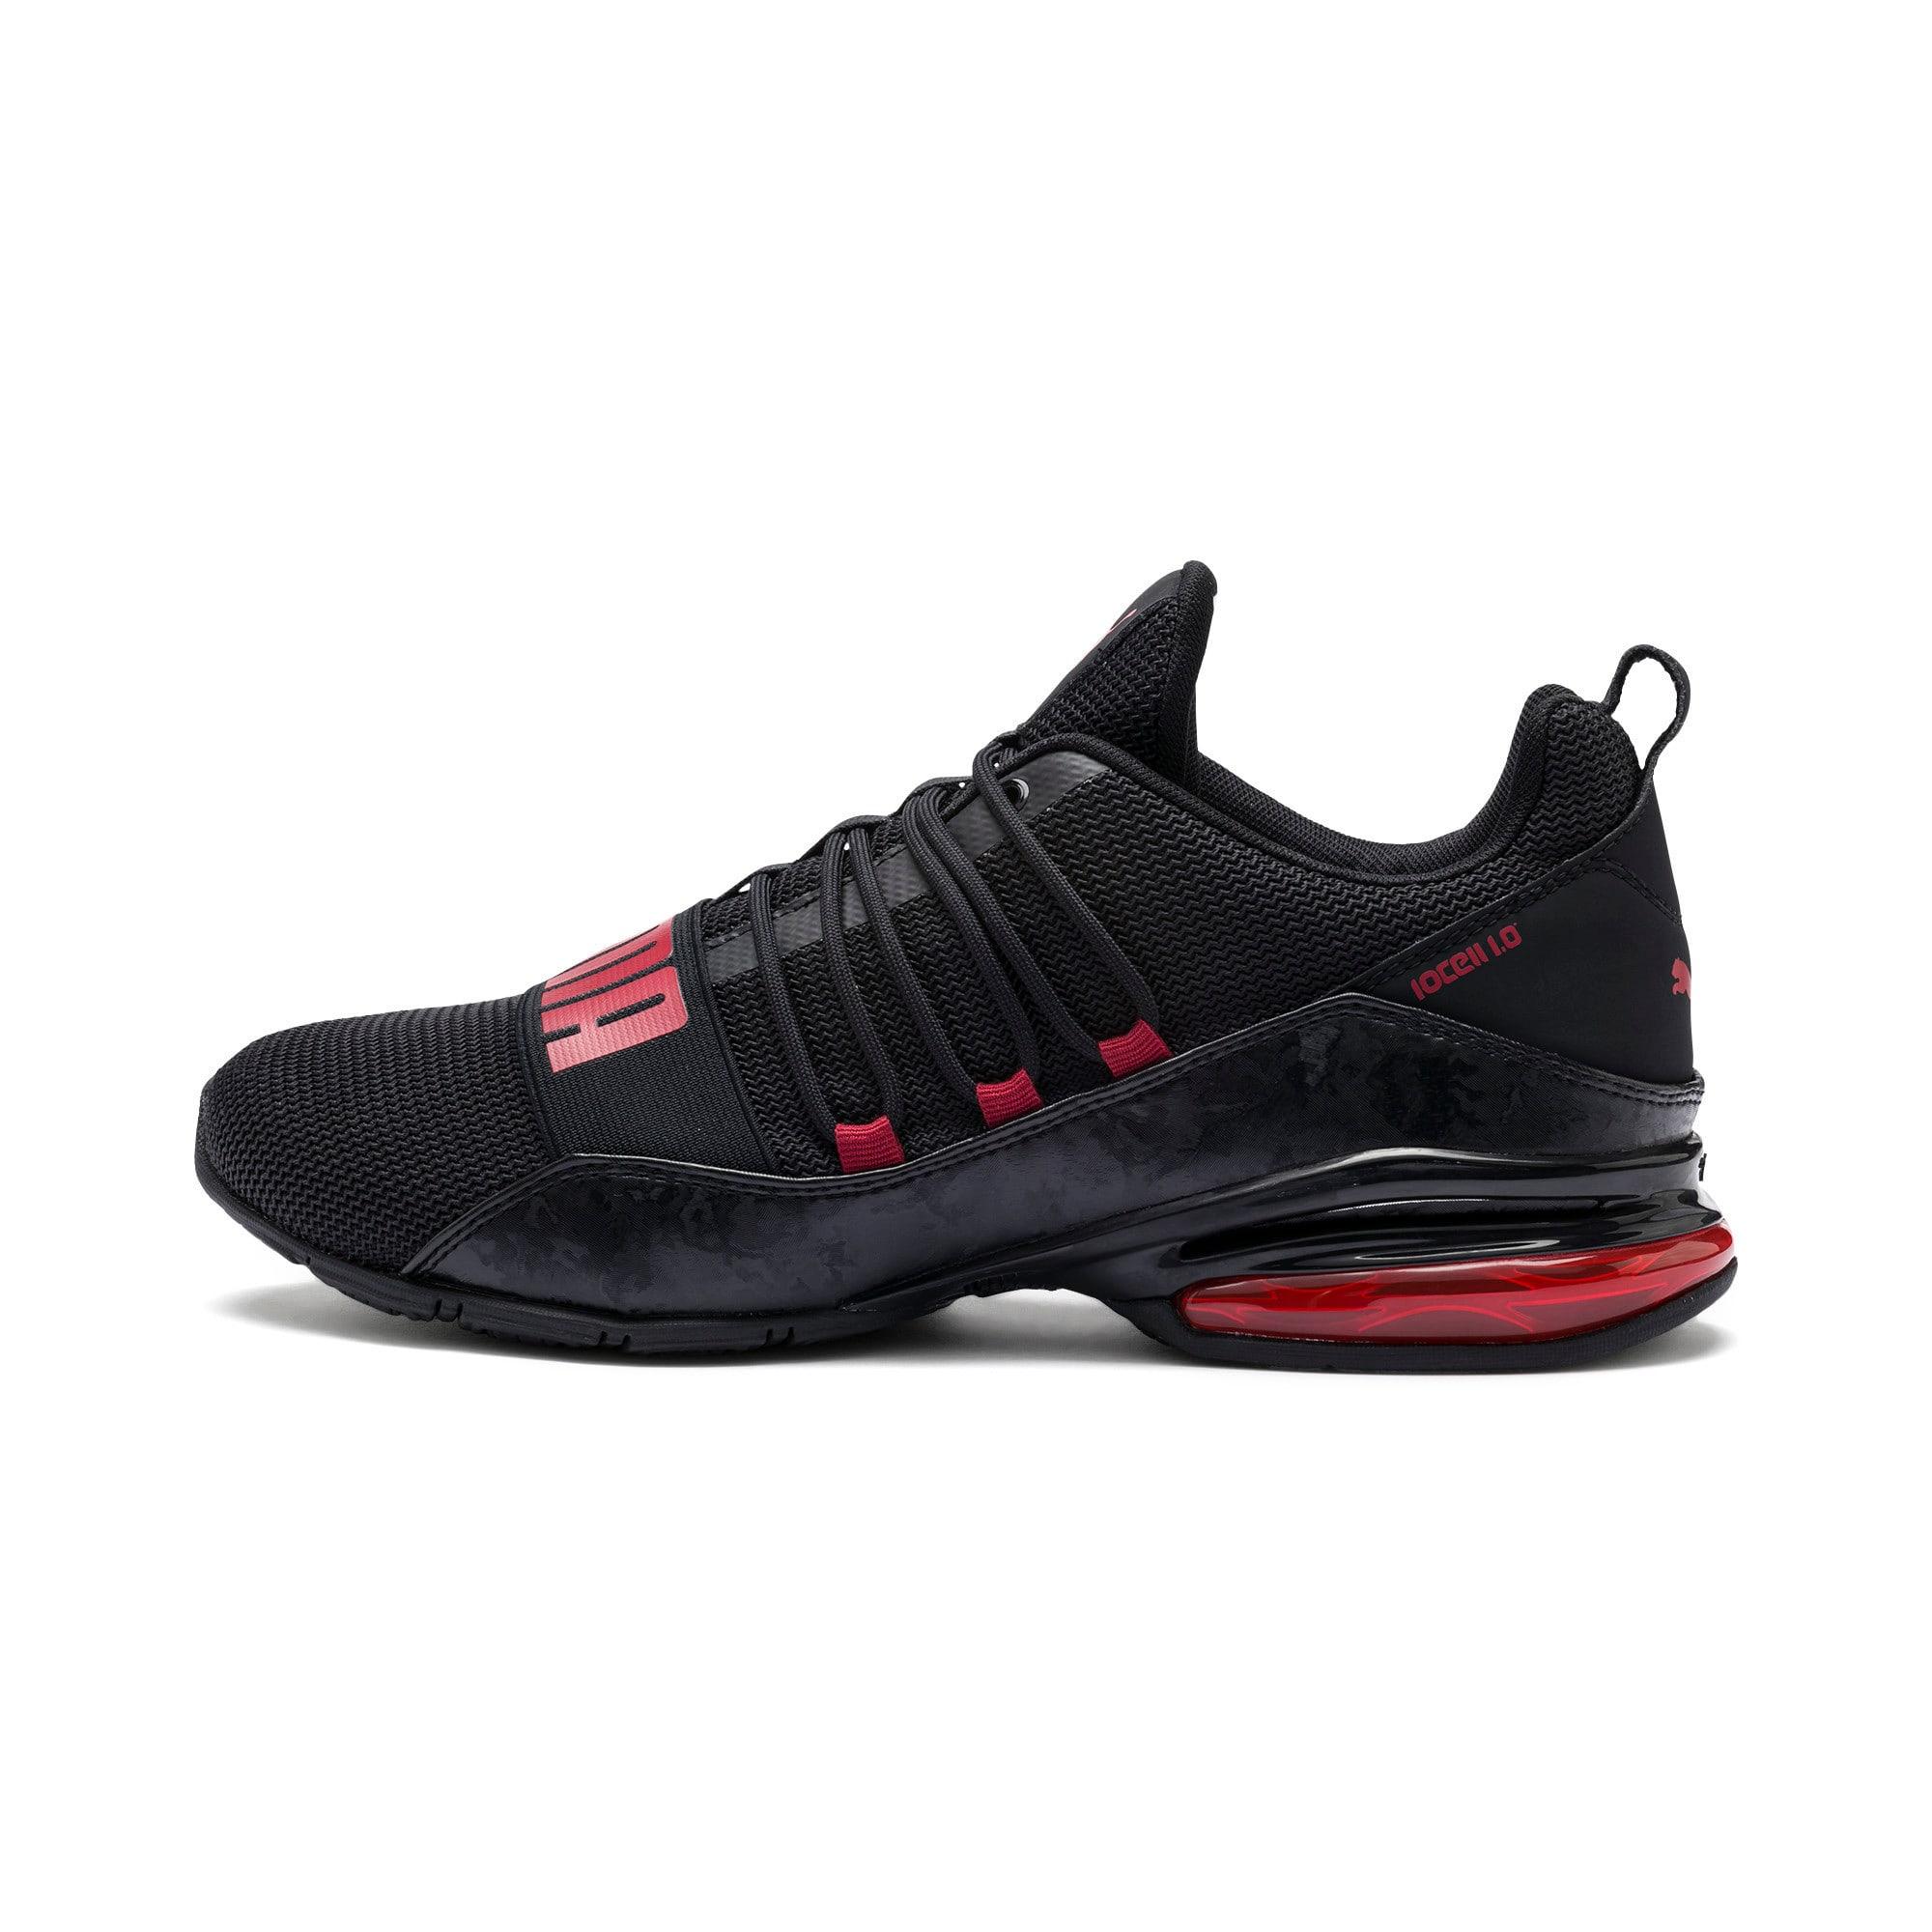 Miniatura 1 de Zapatos de entrenamiento CELL Regulate Camo para hombre, Puma Black-Rhubarb, mediano